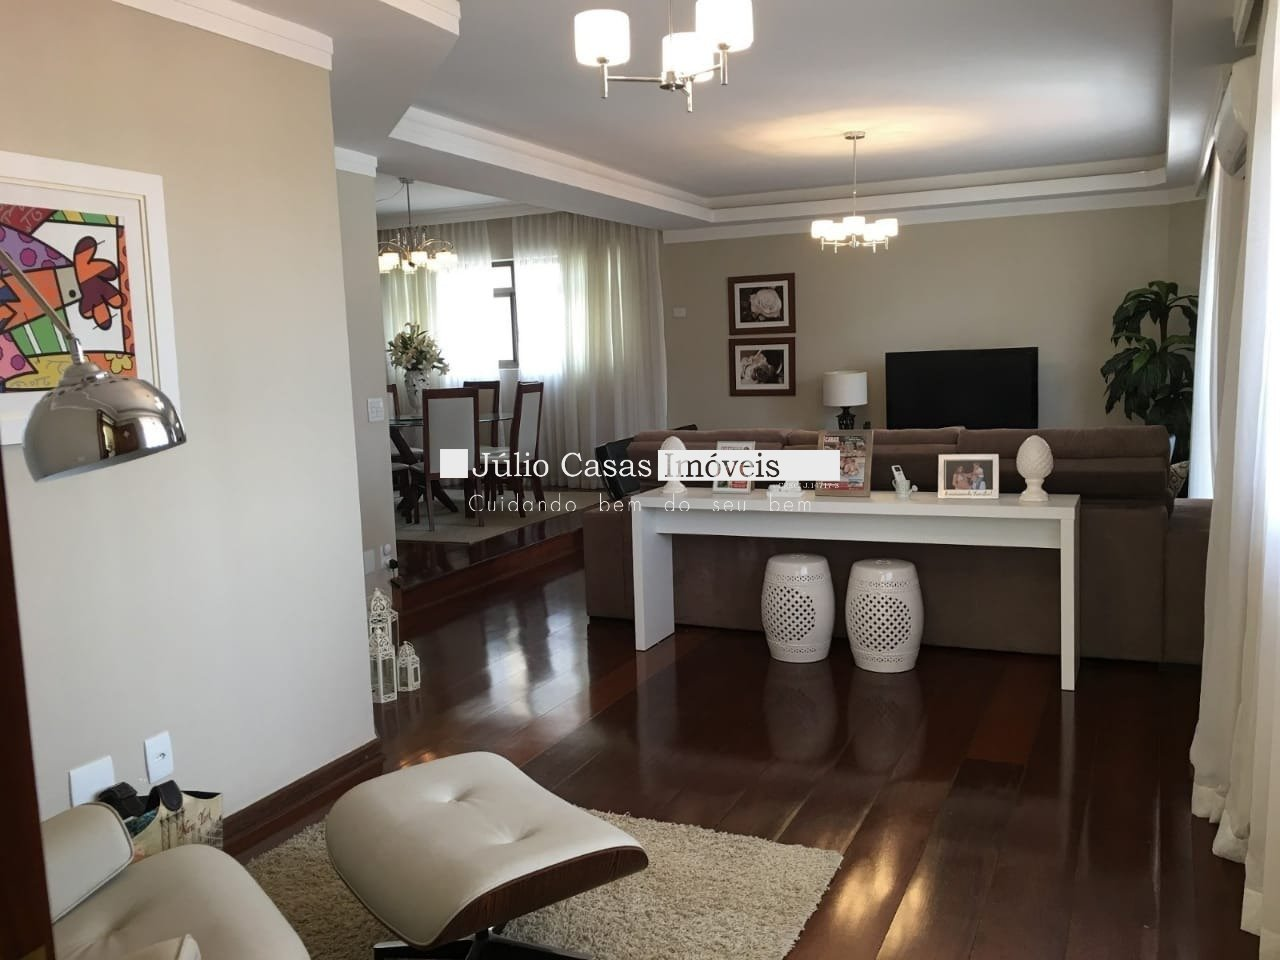 Santa Sofia Apartamento Centro, Sorocaba (27980)